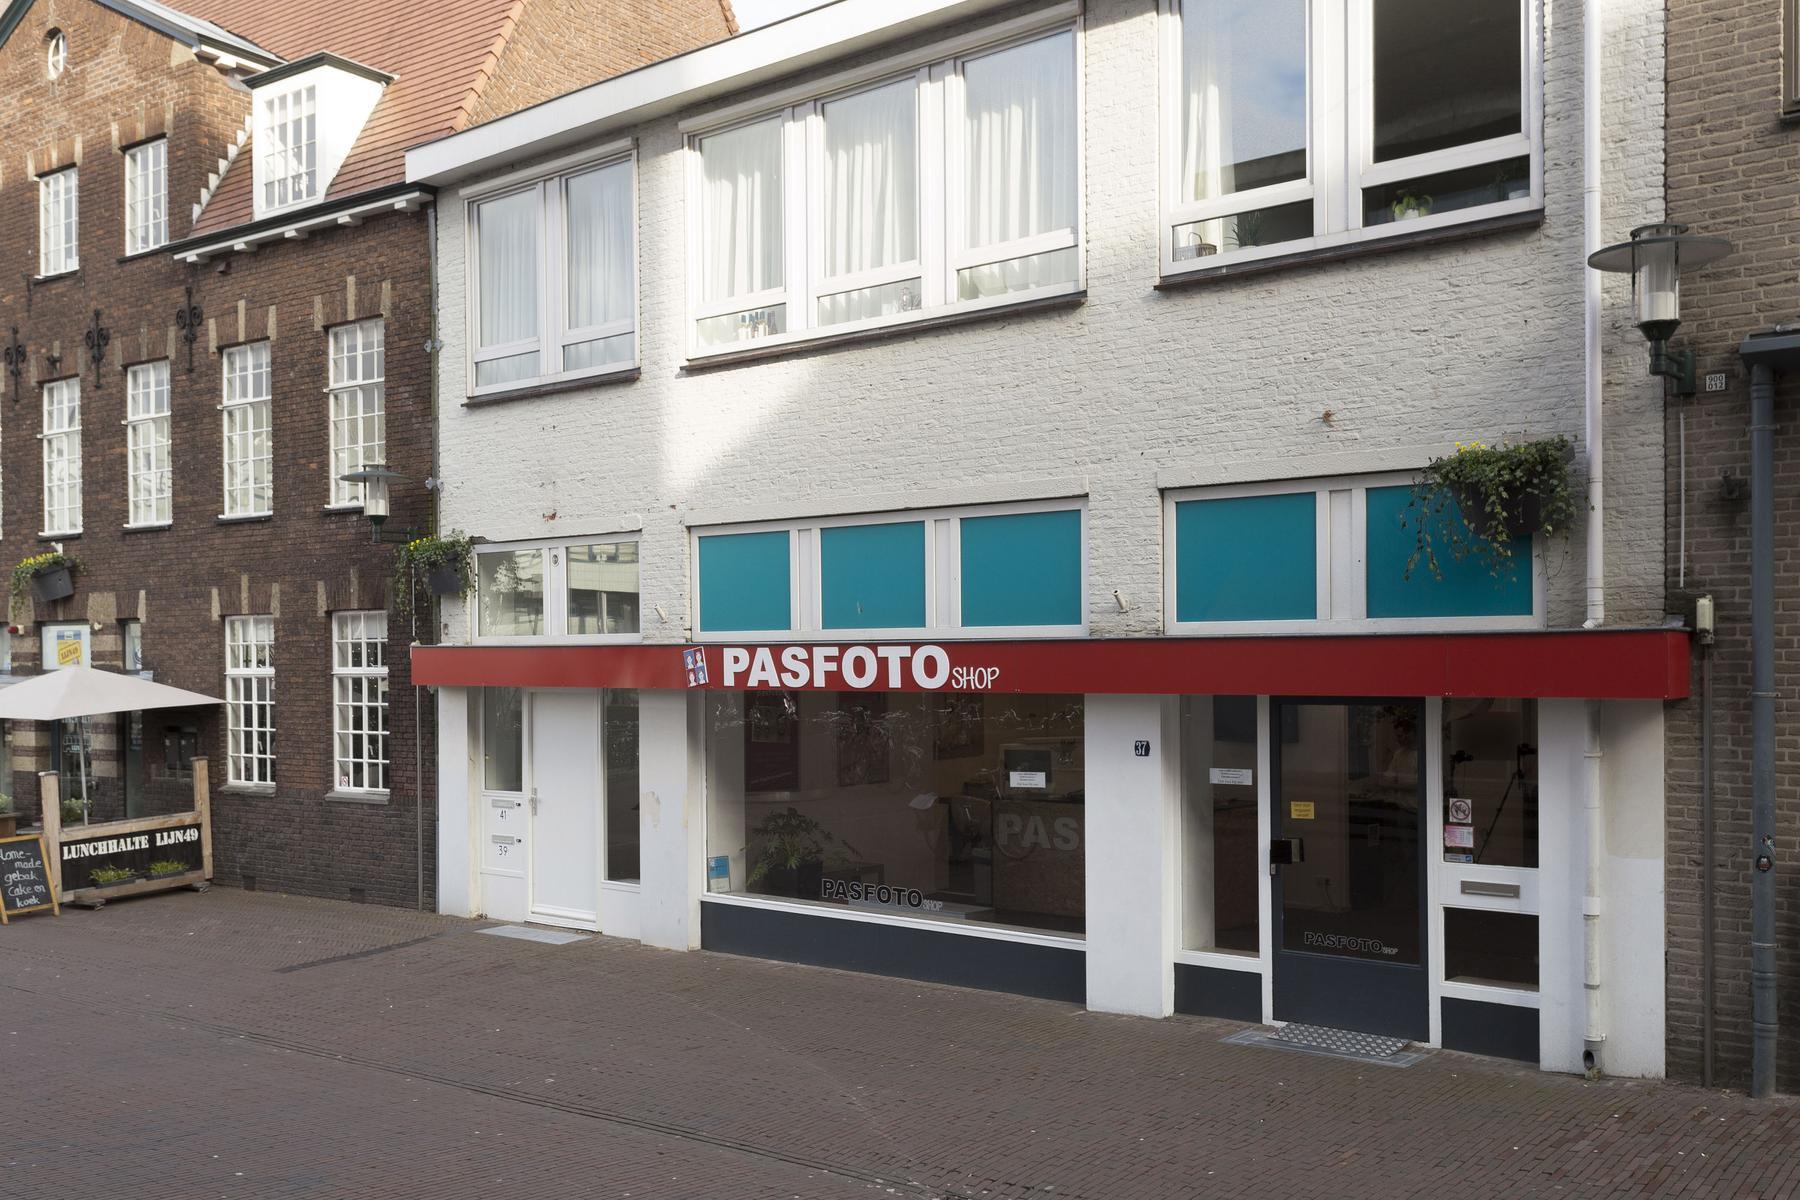 Te huur in de Hellestraat 37 te Amersfoort kantoorruimte via RéBm Bedrijfsmakelaar Amersfoort